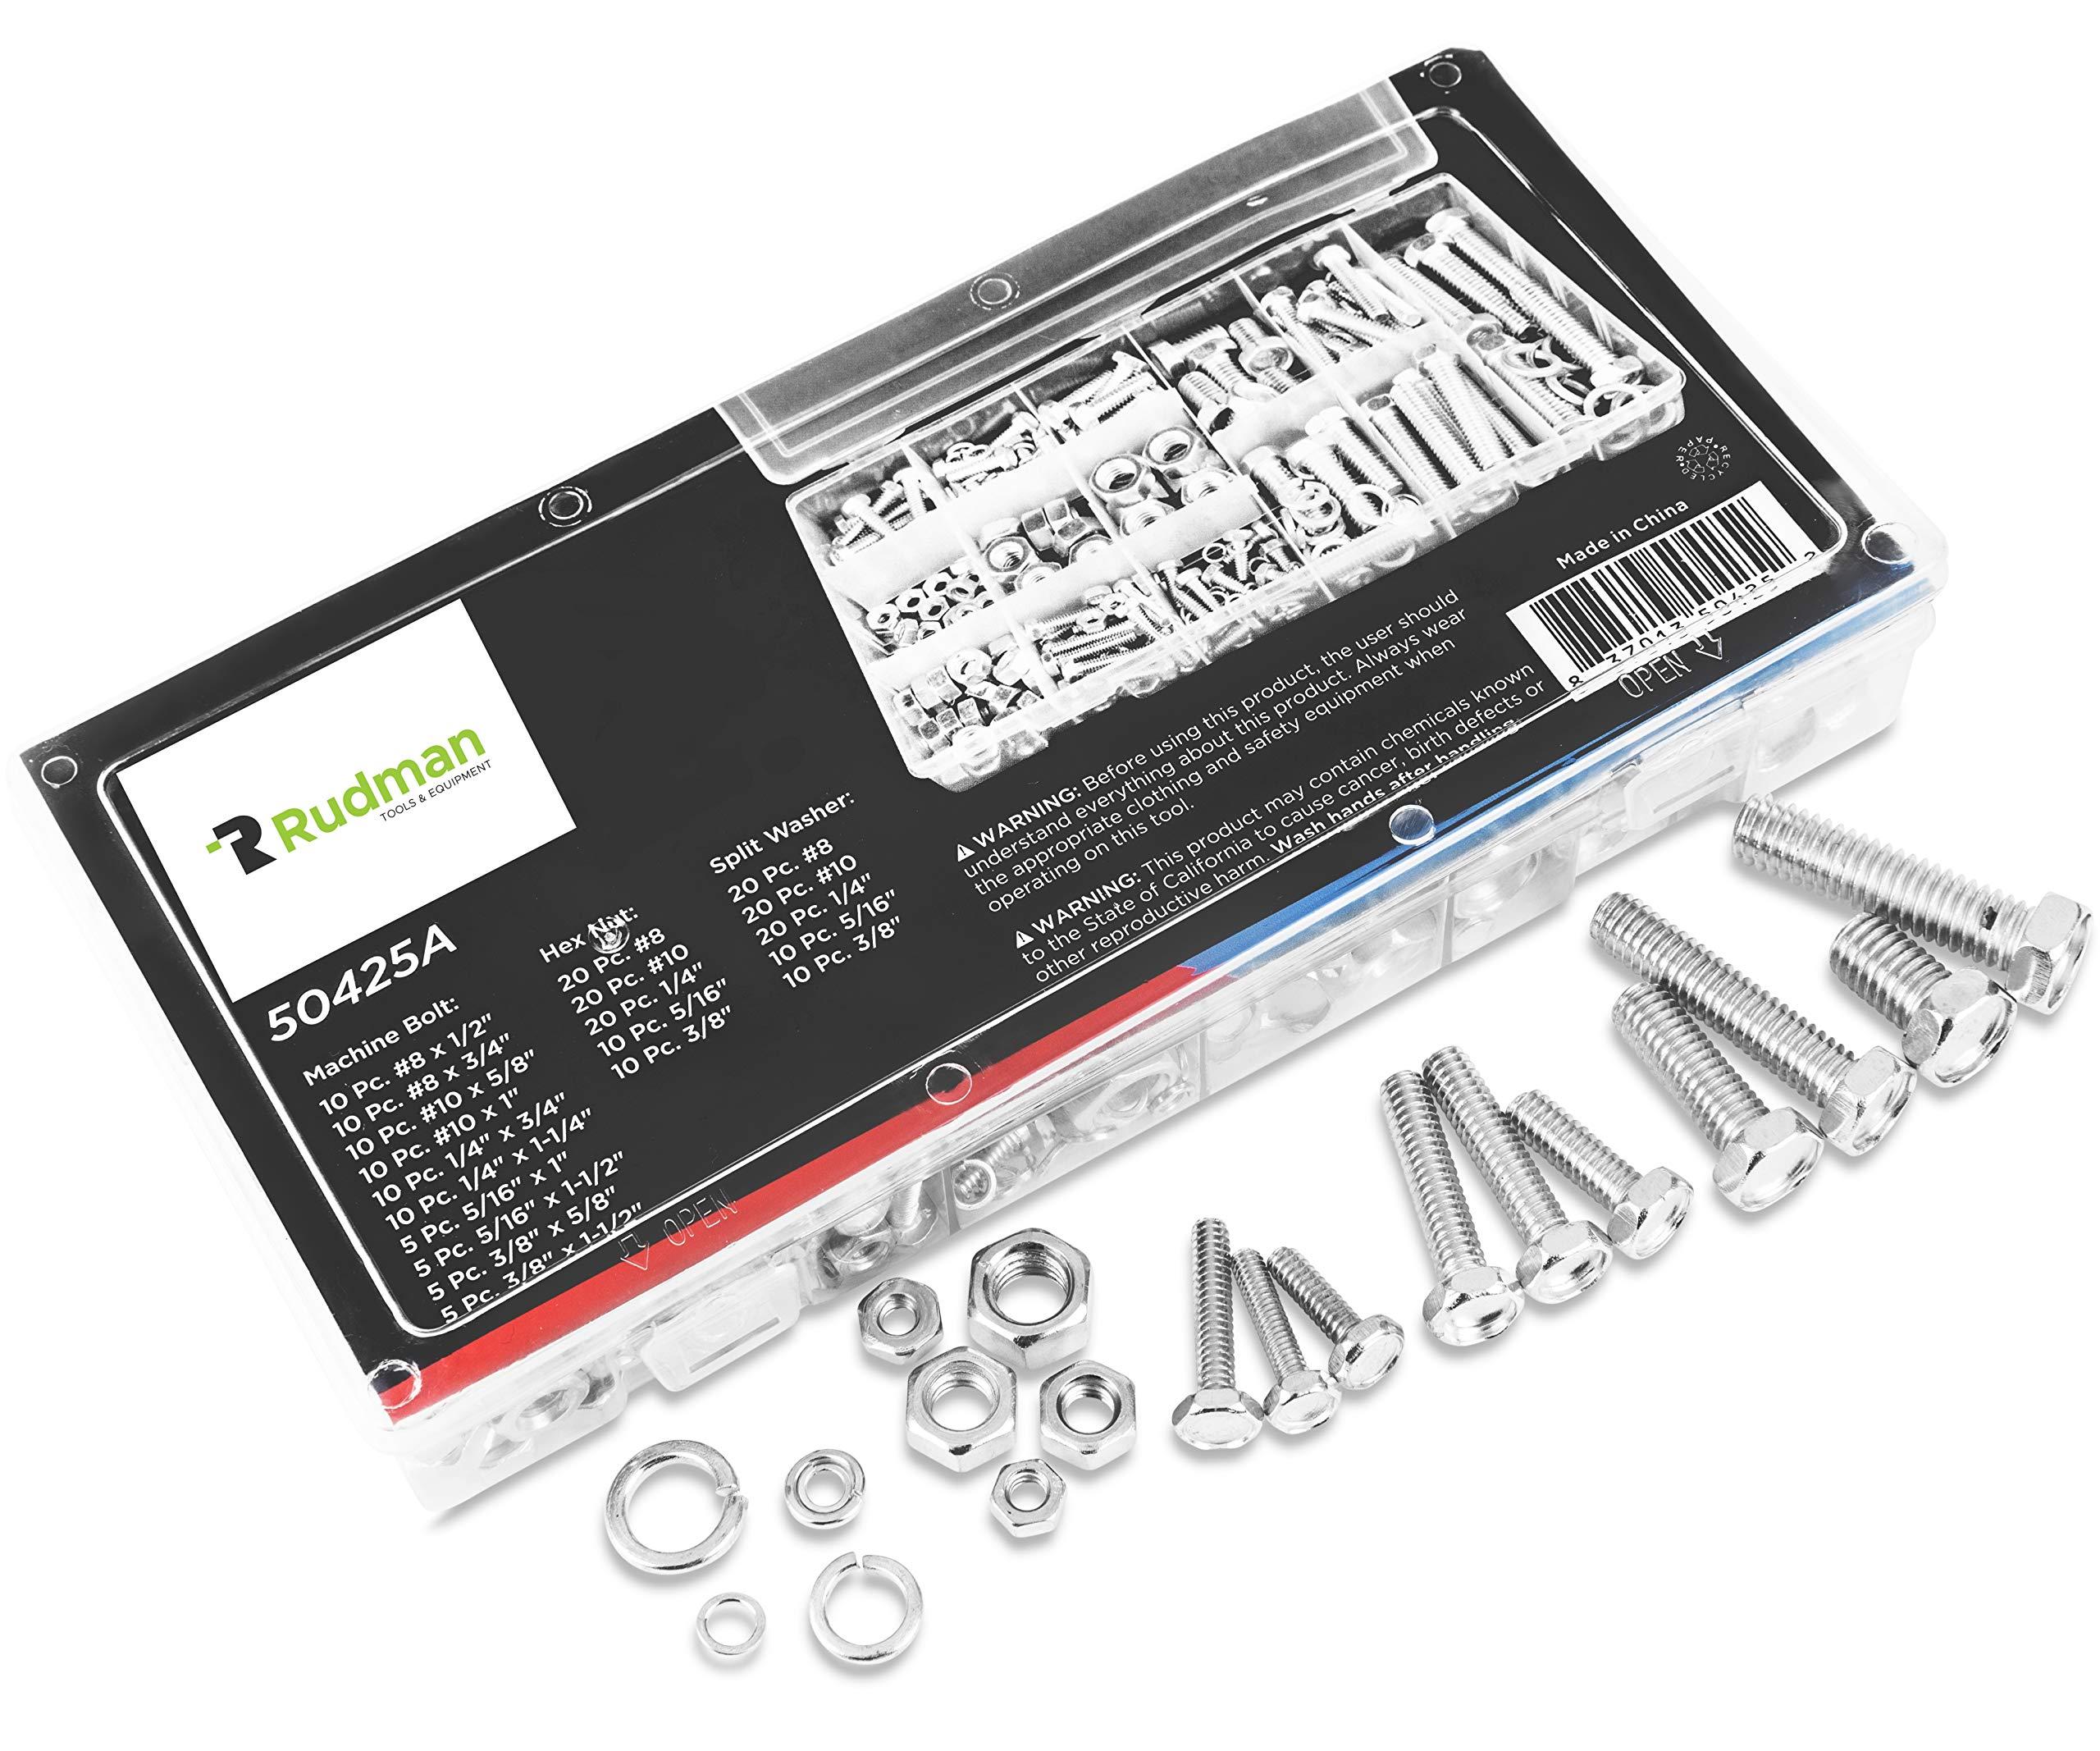 Ruddman Supplies - SAE Standard Assorted Nut and Bolt Hardware Set with Hard Plastic Organizing Case - 240 Piece Set by Ruddman Supplies (Image #3)